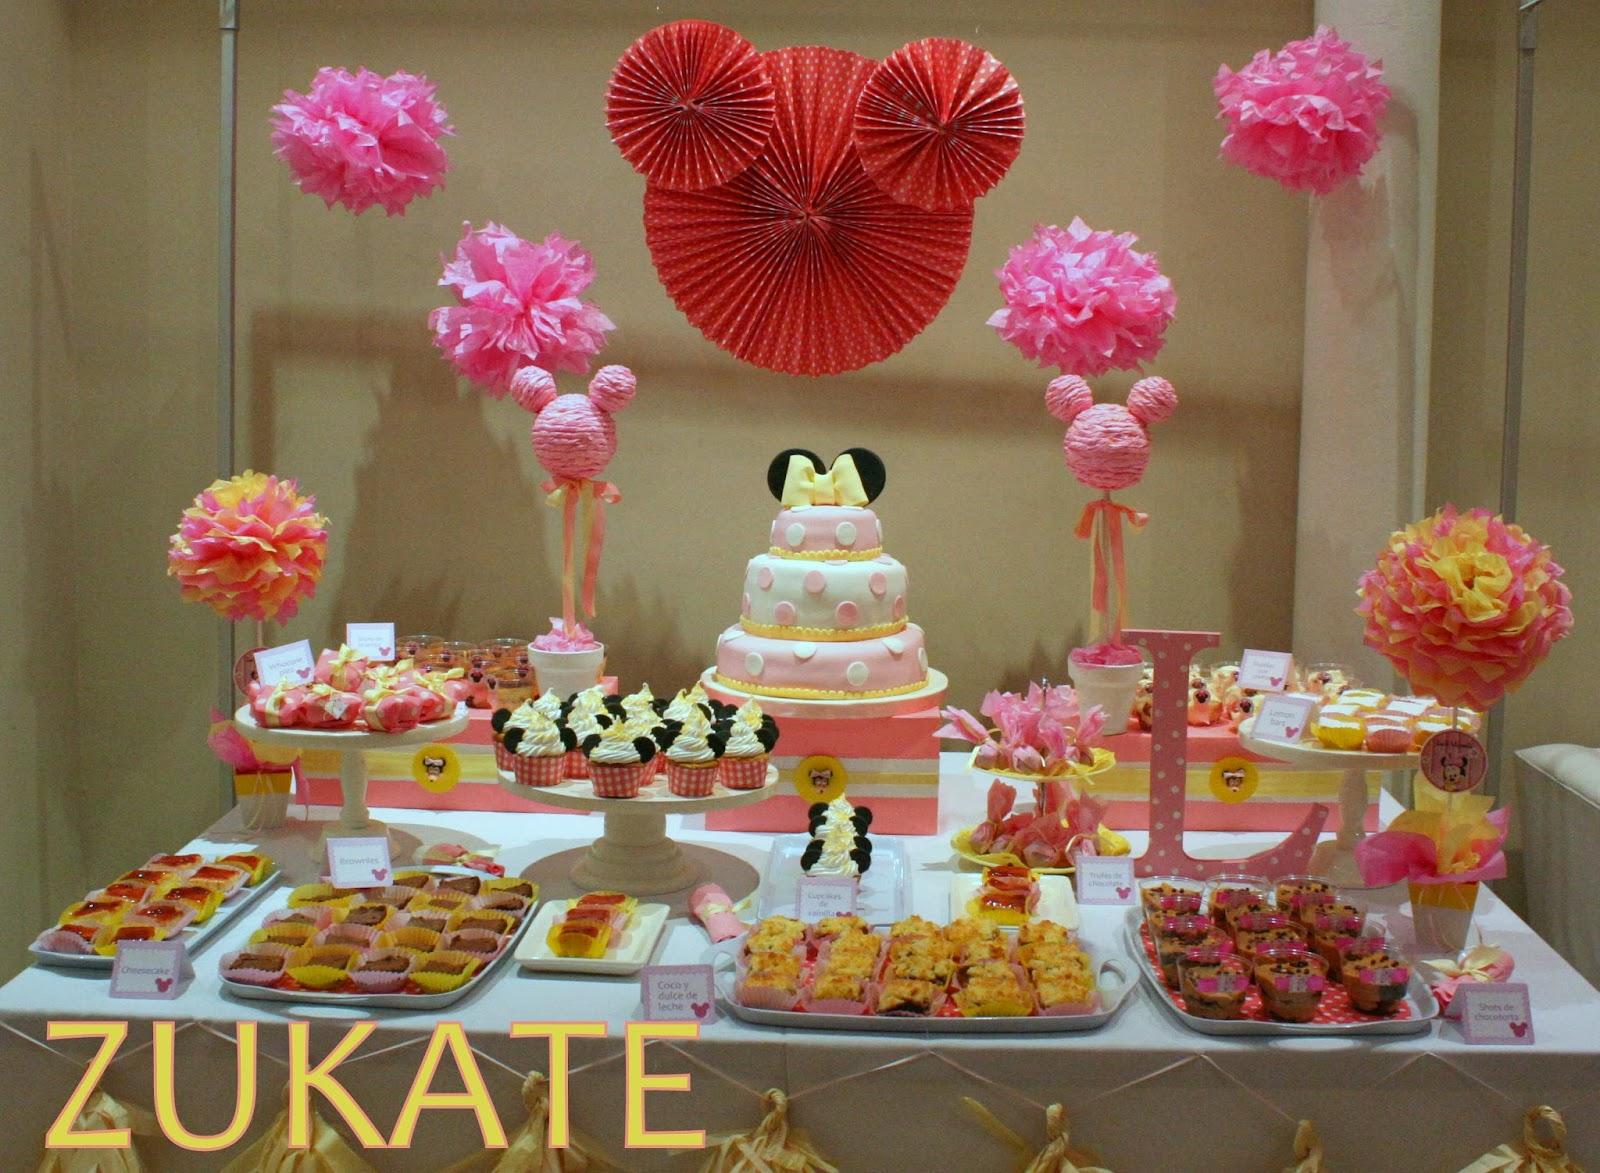 Fiesta de minnie mouse para lucia zukate for Como hacer una fiesta de 15